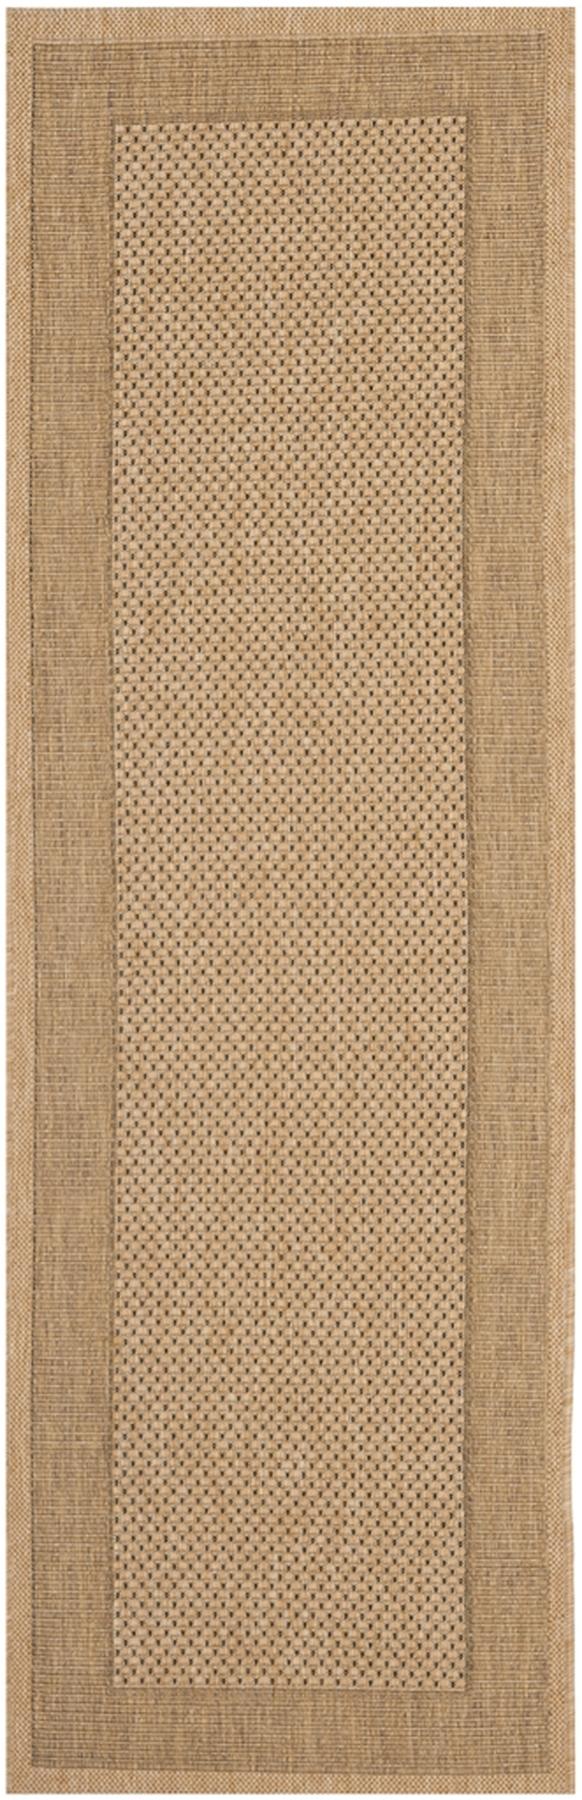 tone on tone gold area rug safavieh indoor outdoor rugs